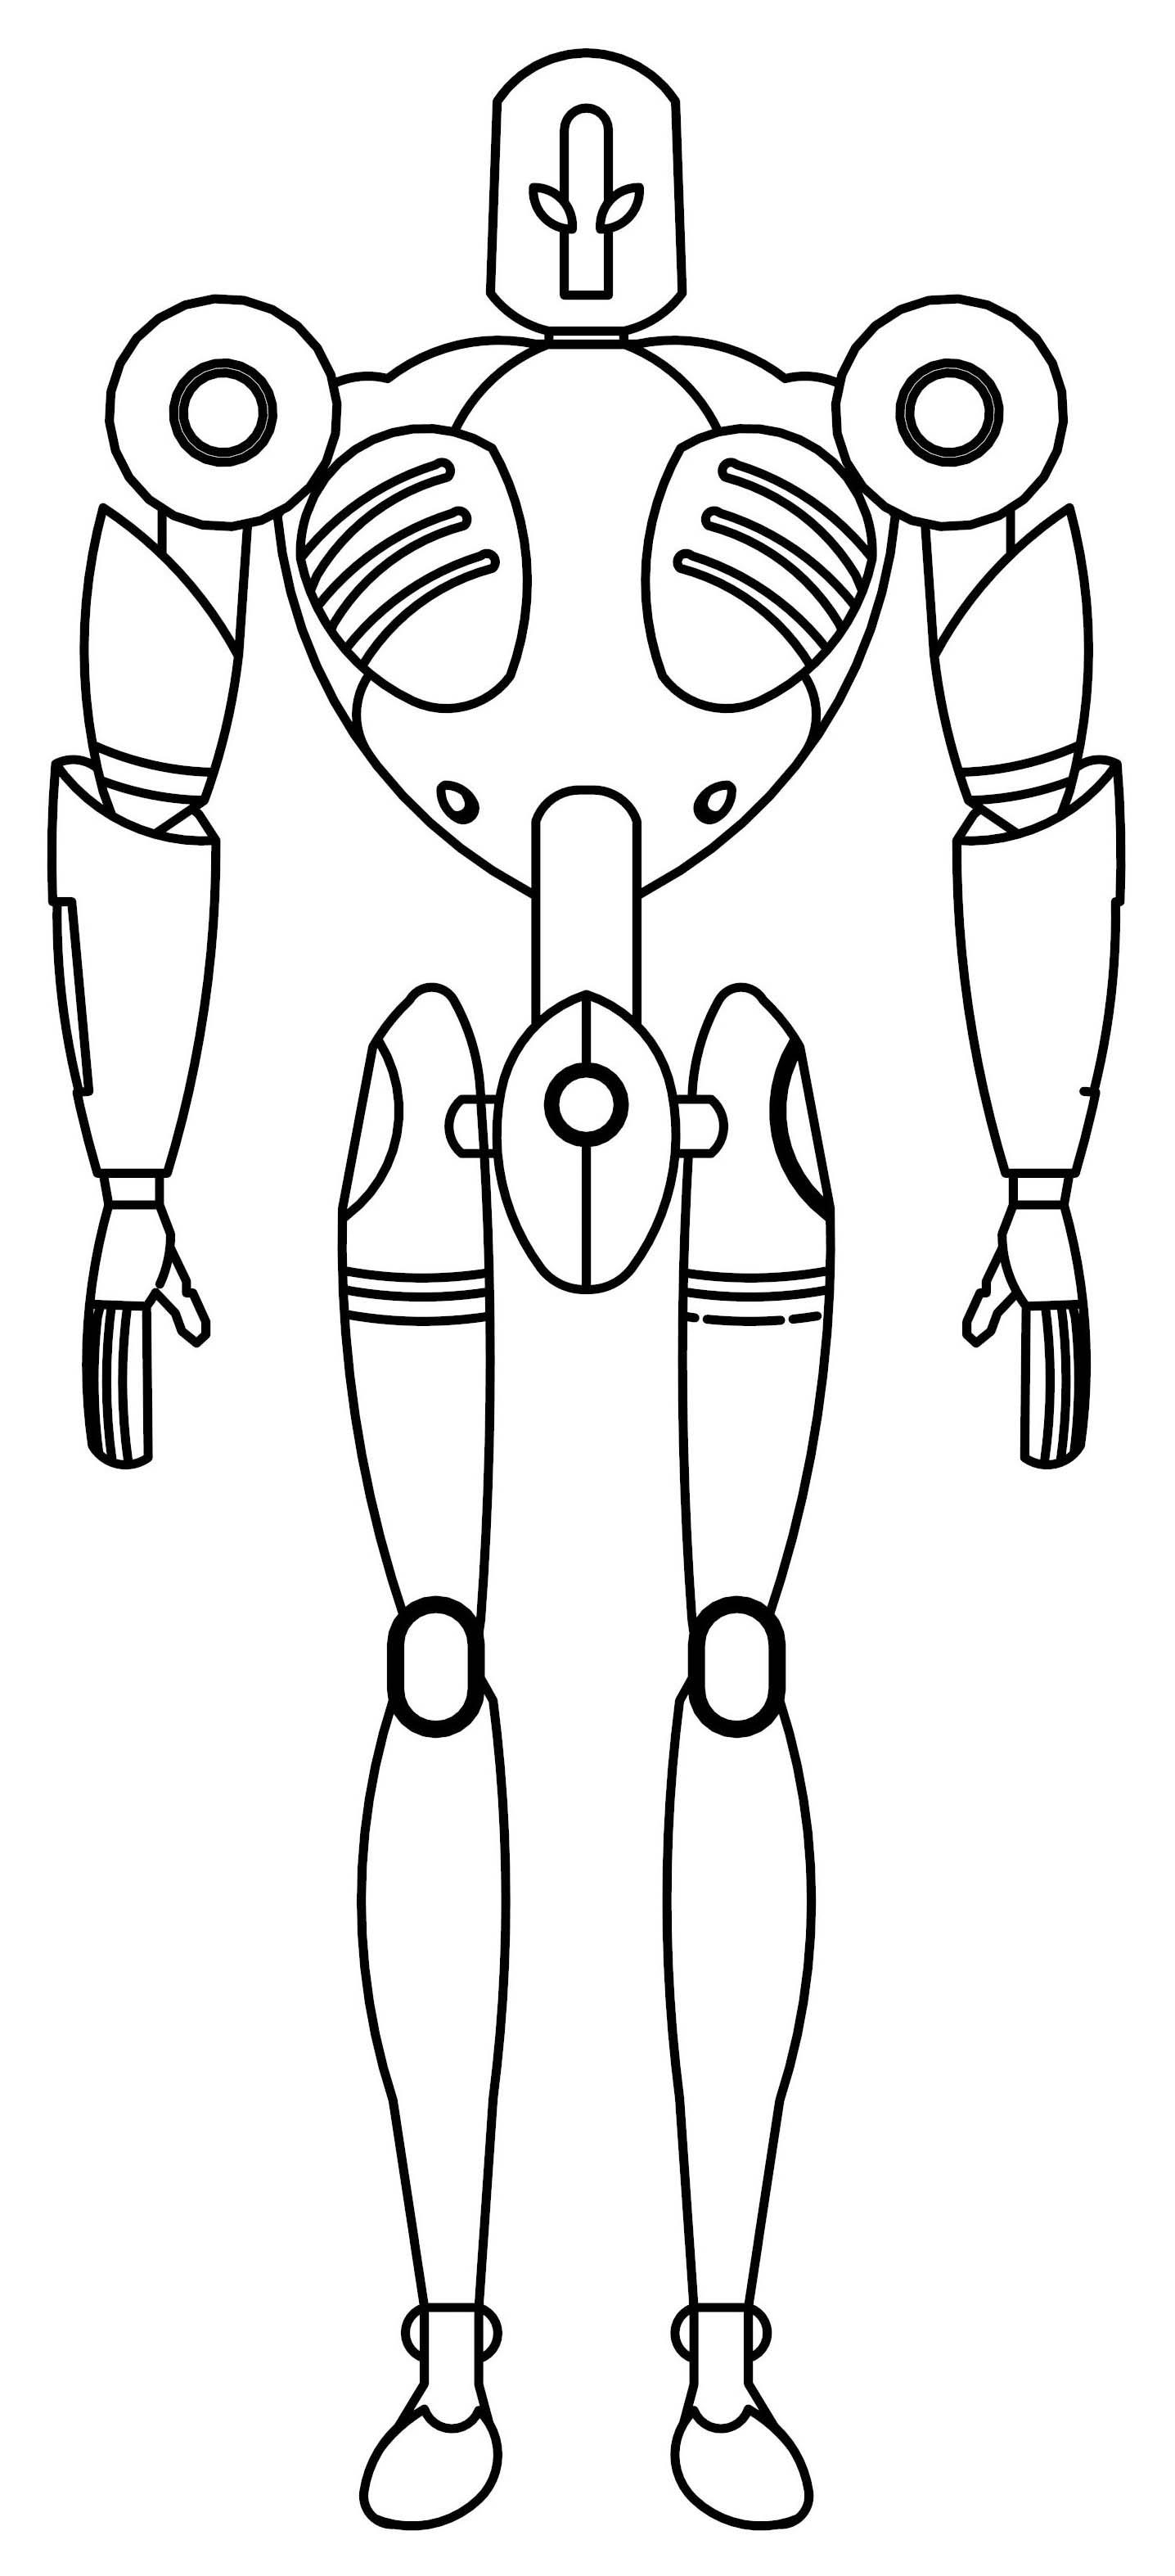 projec zeta robot coloring page